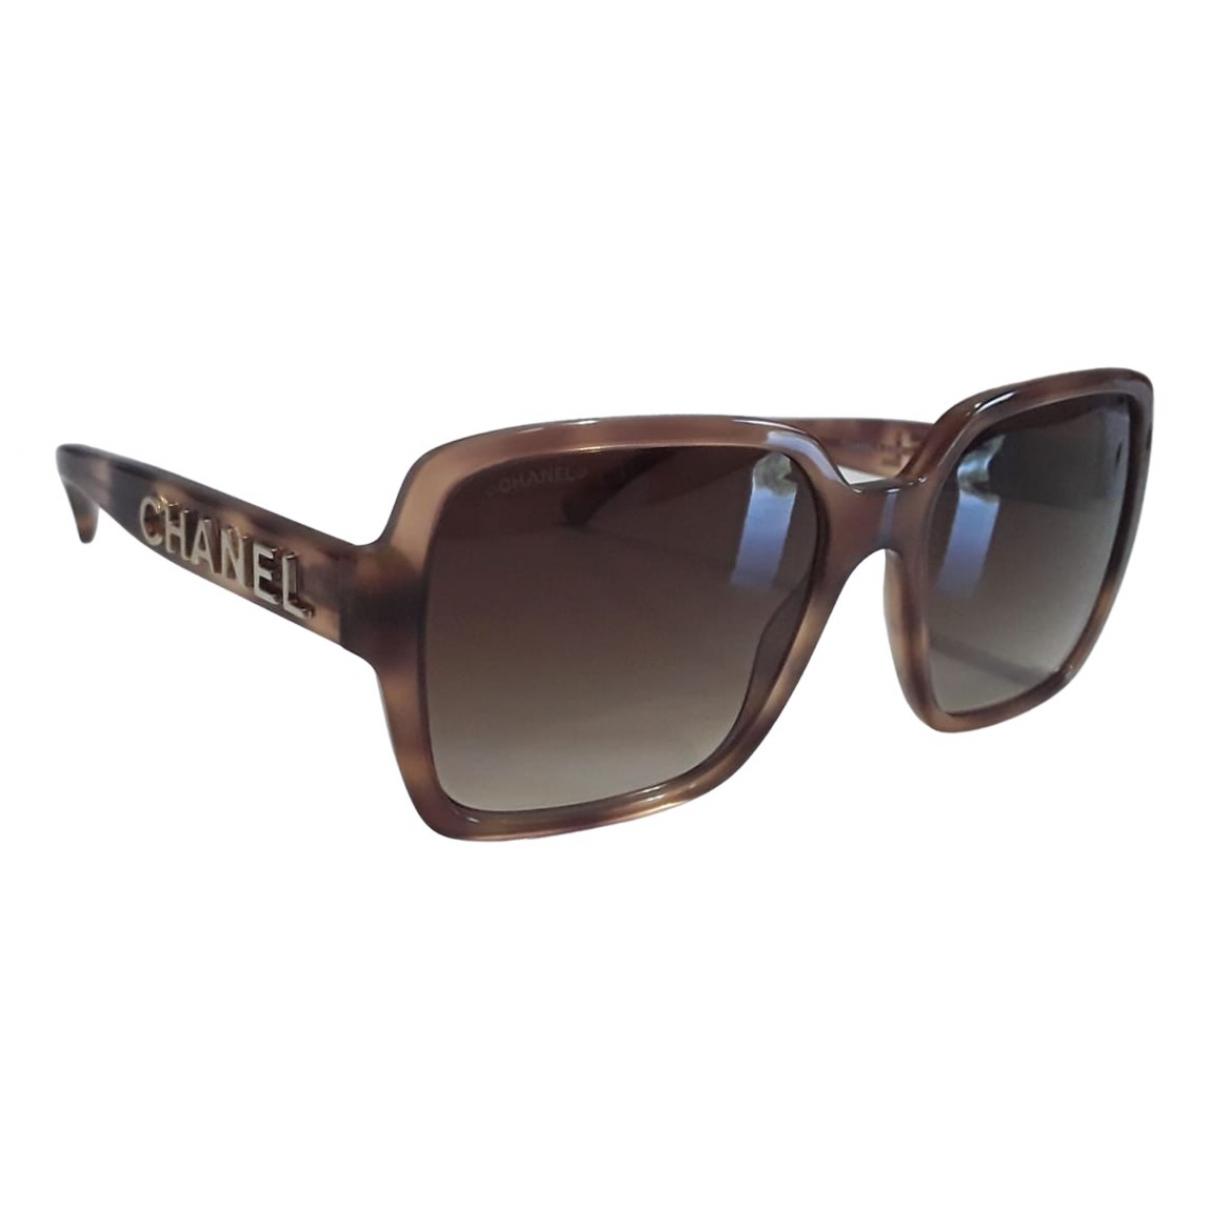 Chanel \N Brown Sunglasses for Women \N